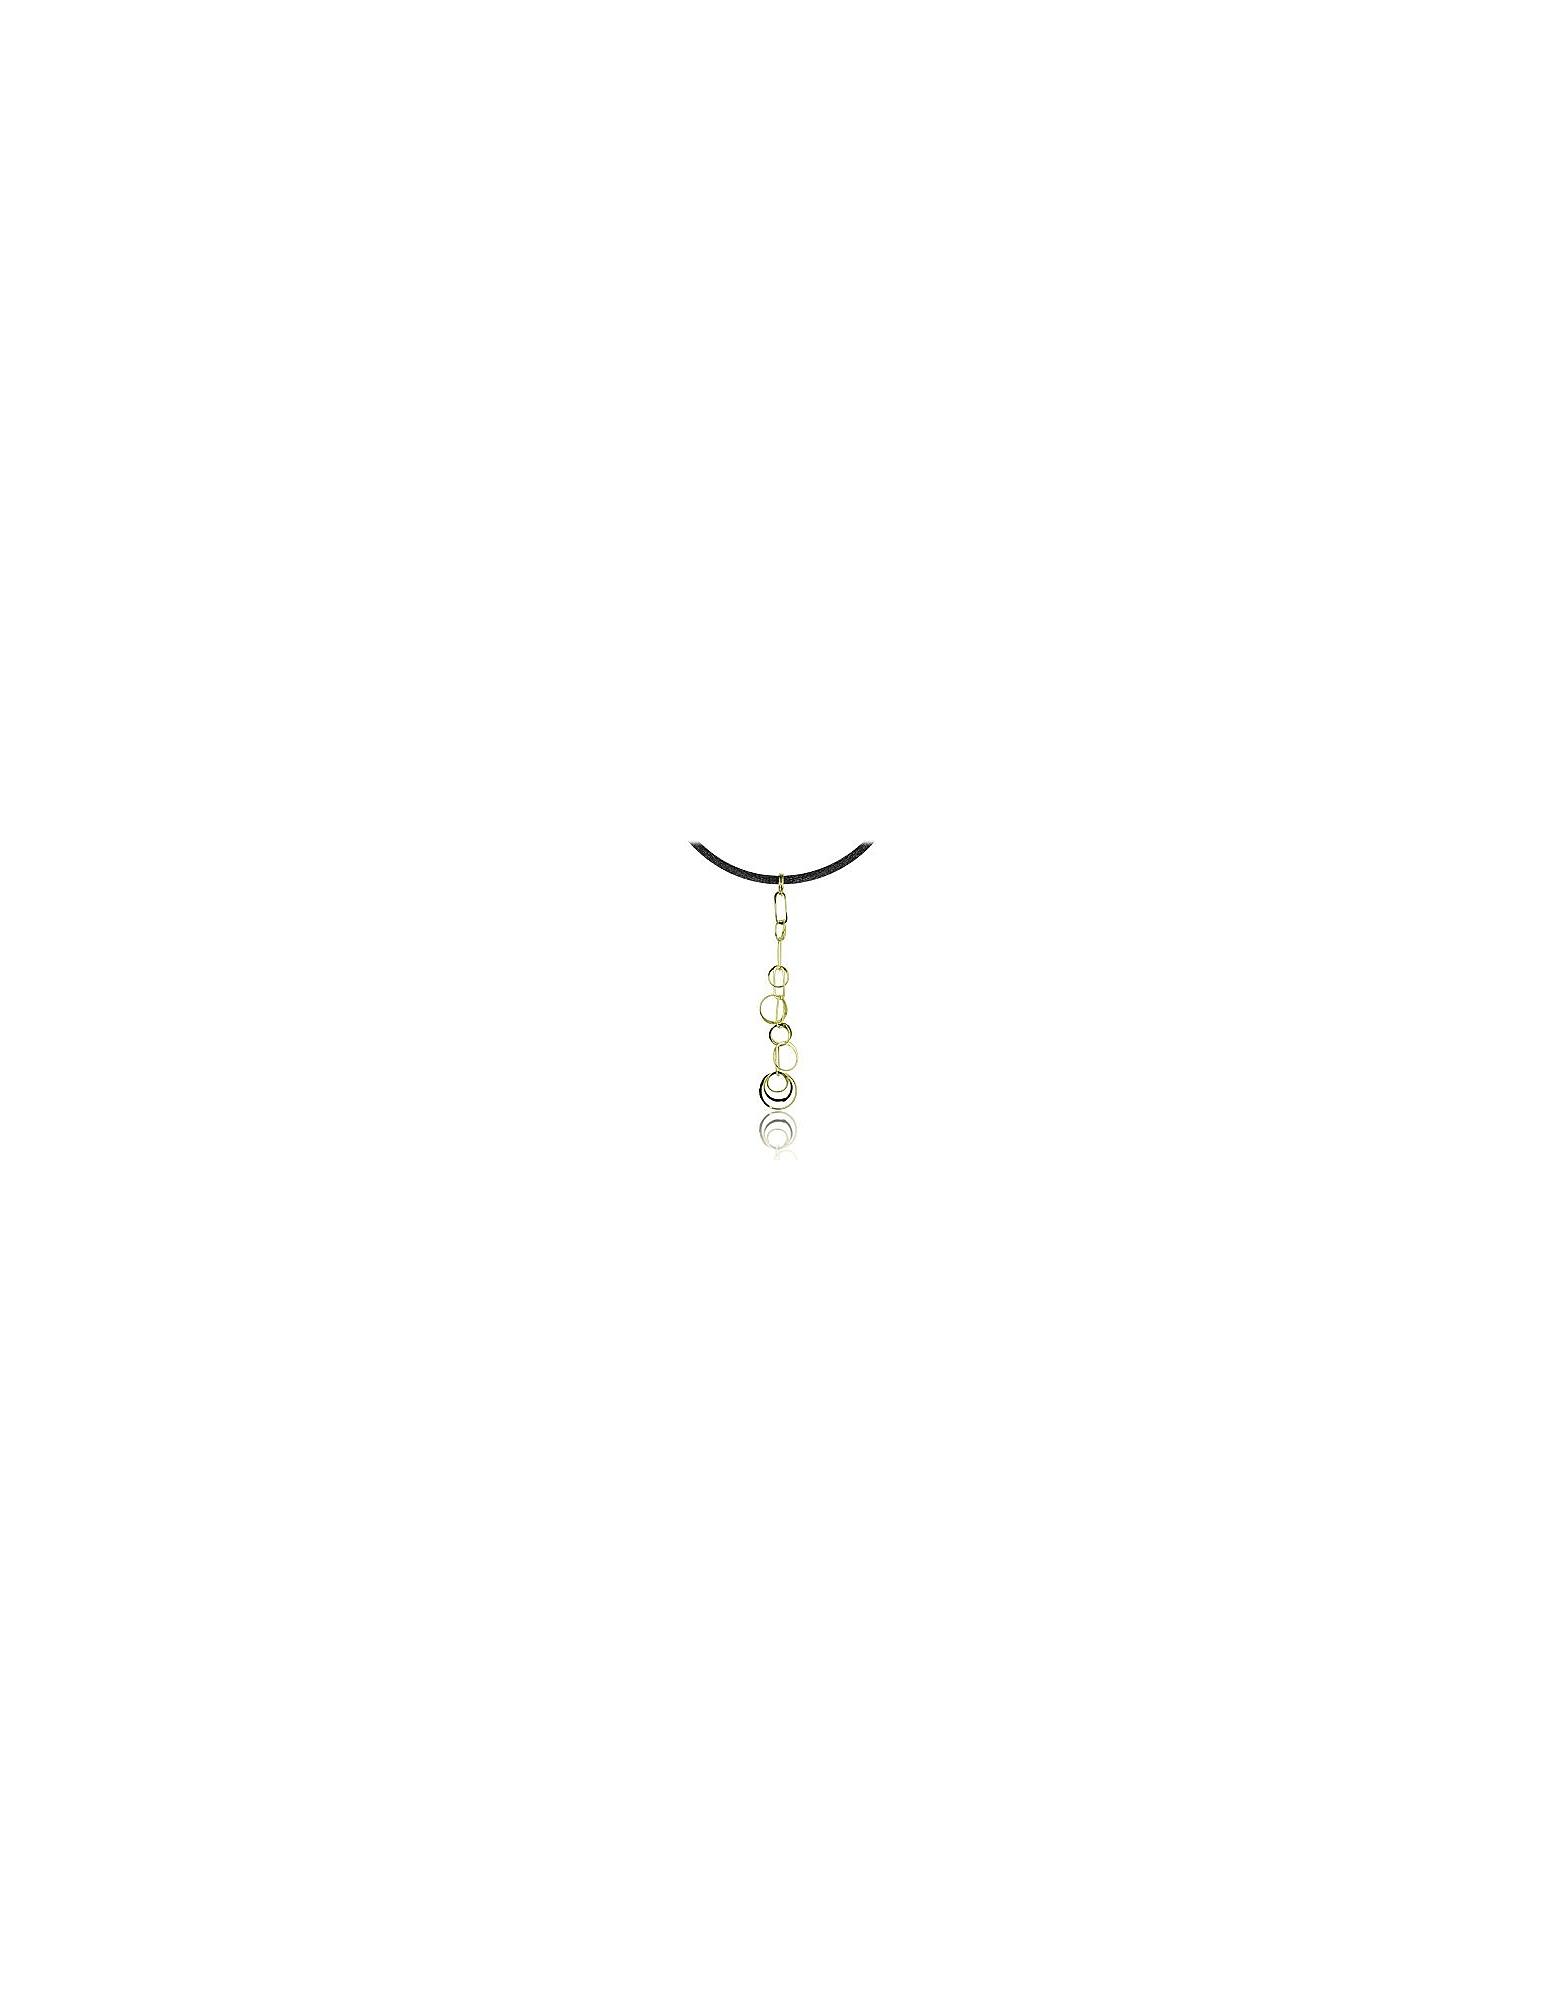 Orlando Orlandini Necklaces, Star - 18K Gold Circles Drop Pendant w/Lace